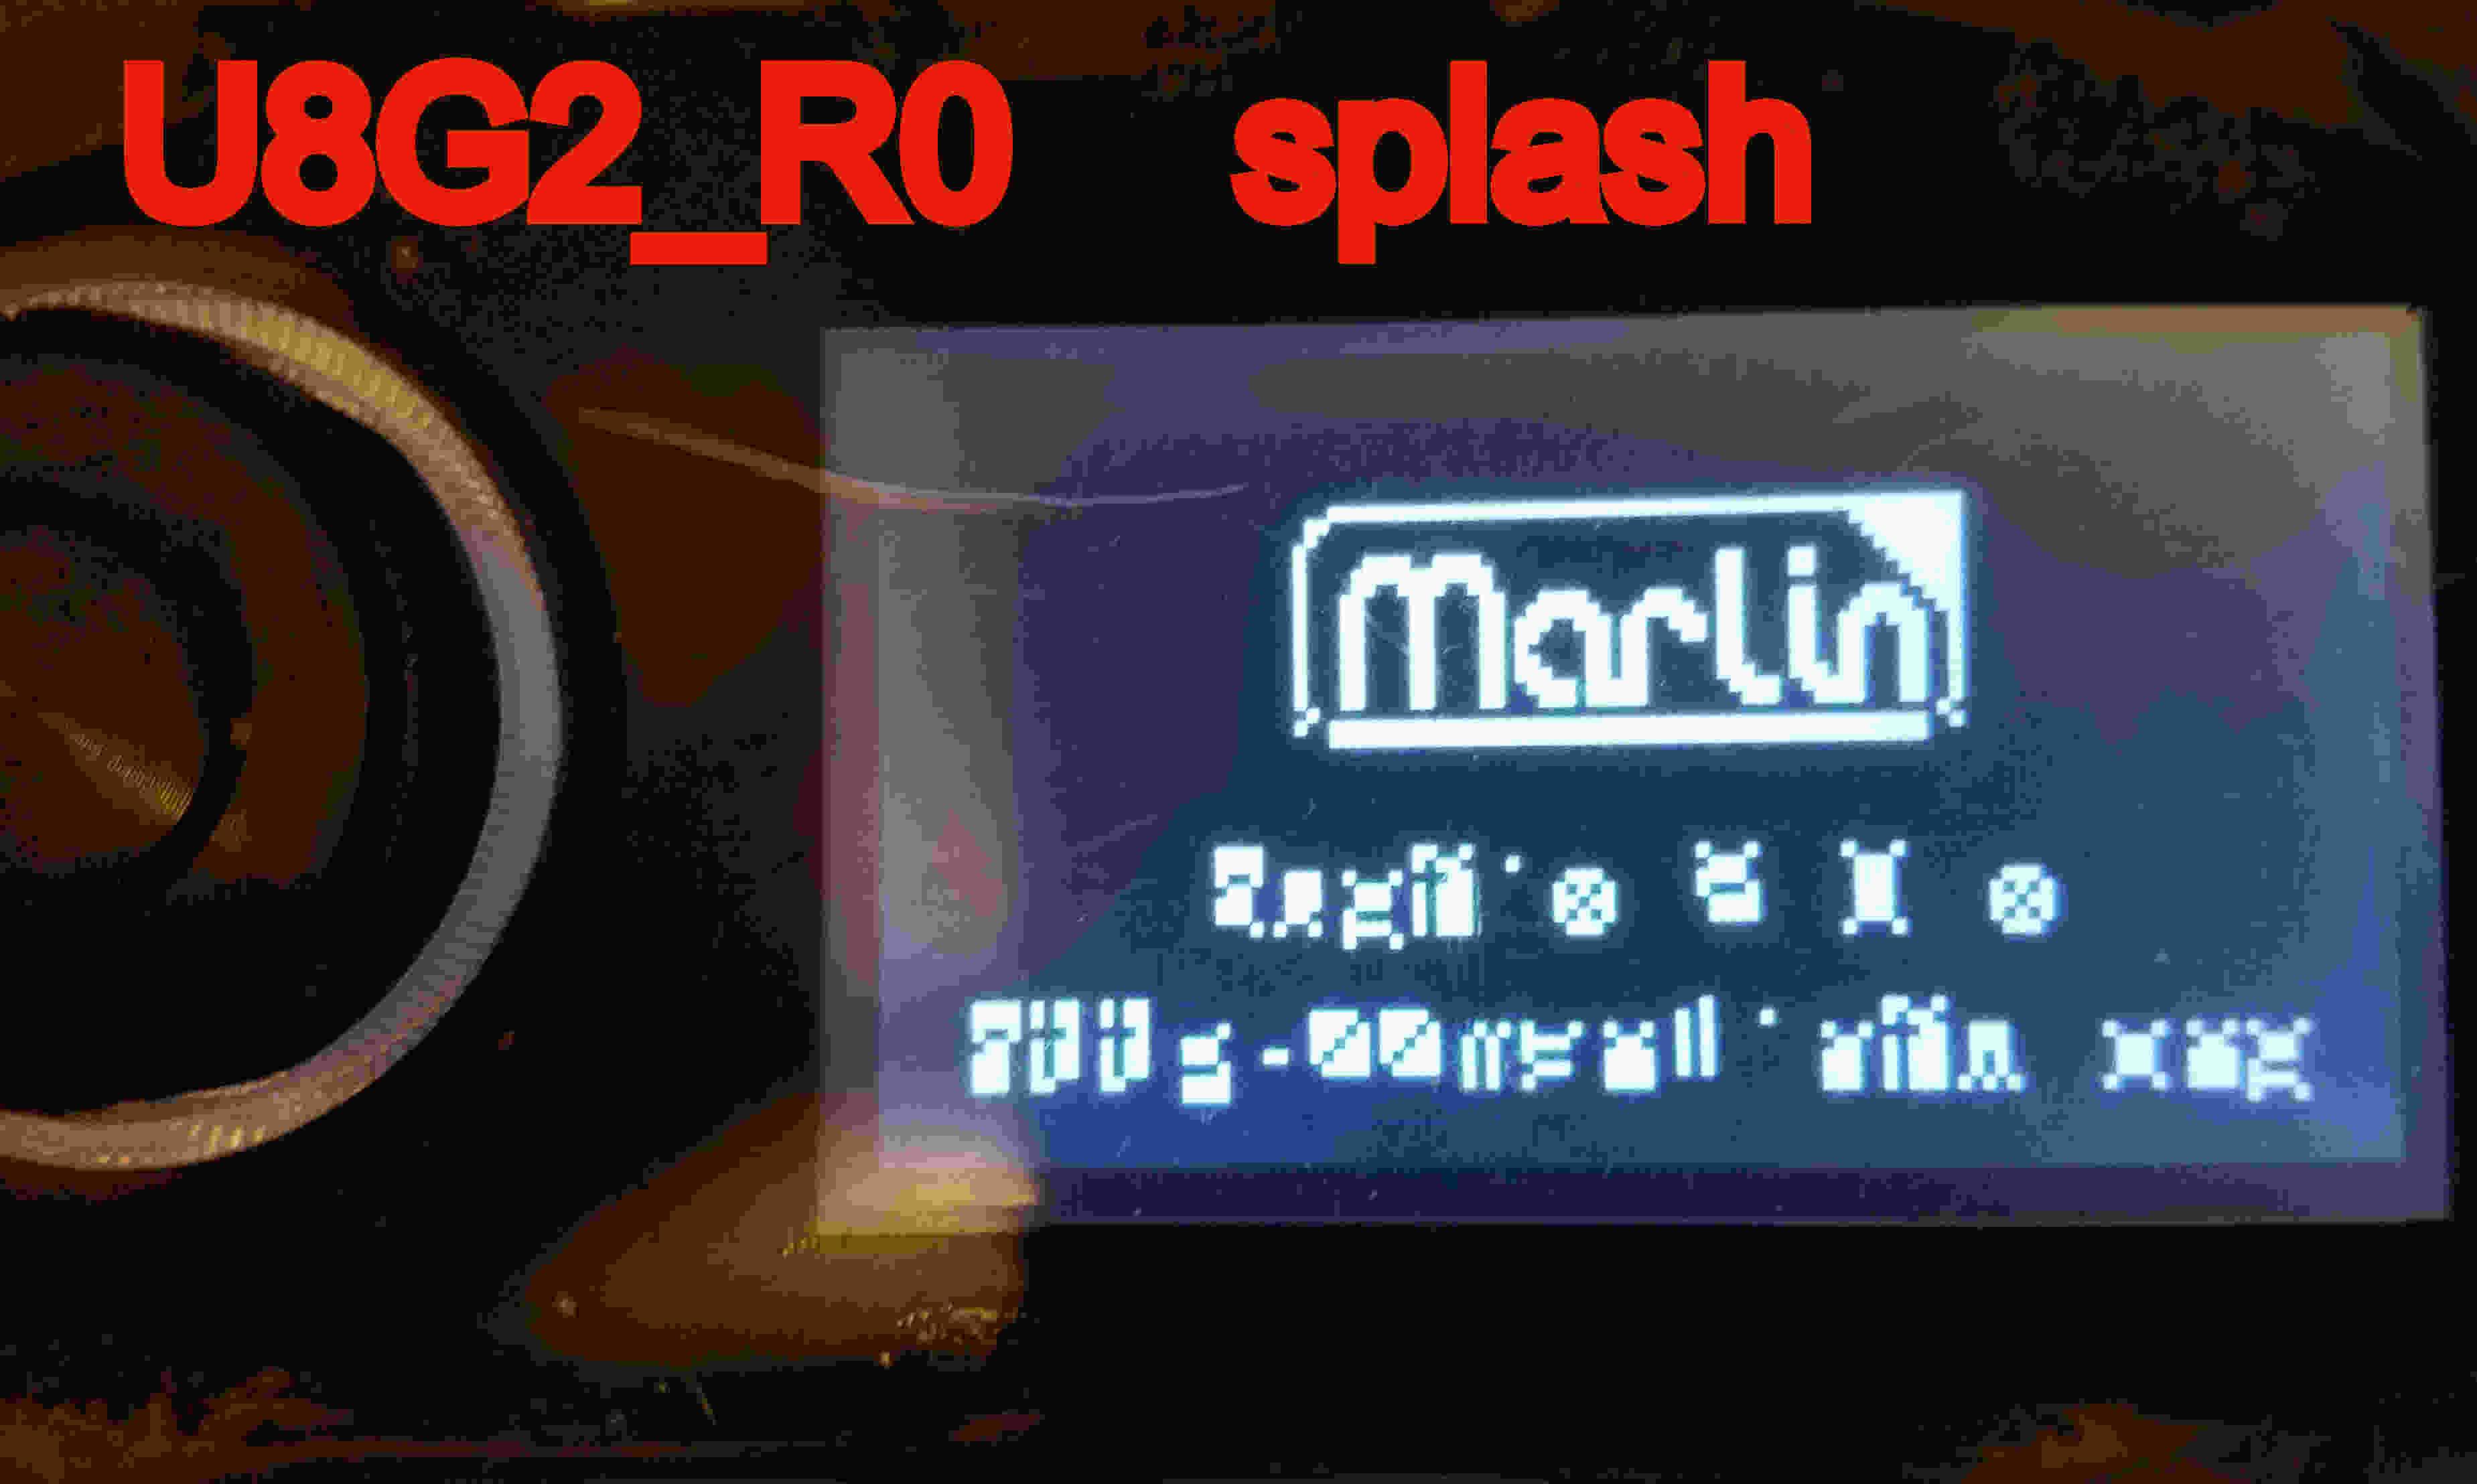 Marlin 32 bit port to U8G2 - need some help / Bug: drawBitmap